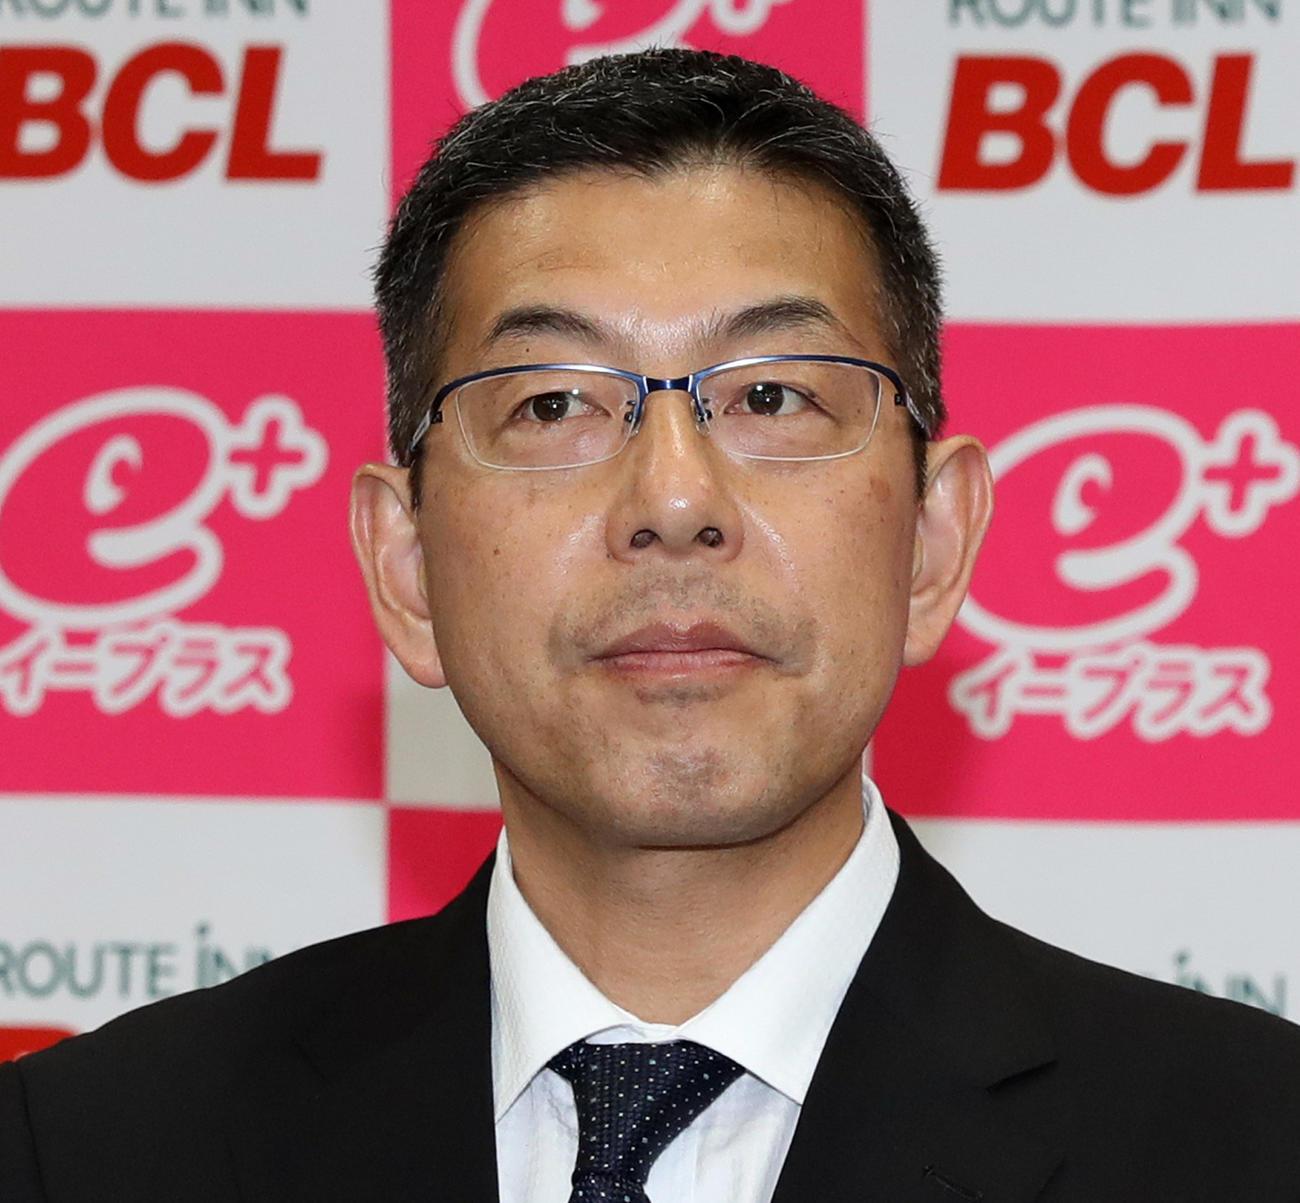 BCリーグ村山哲二代表